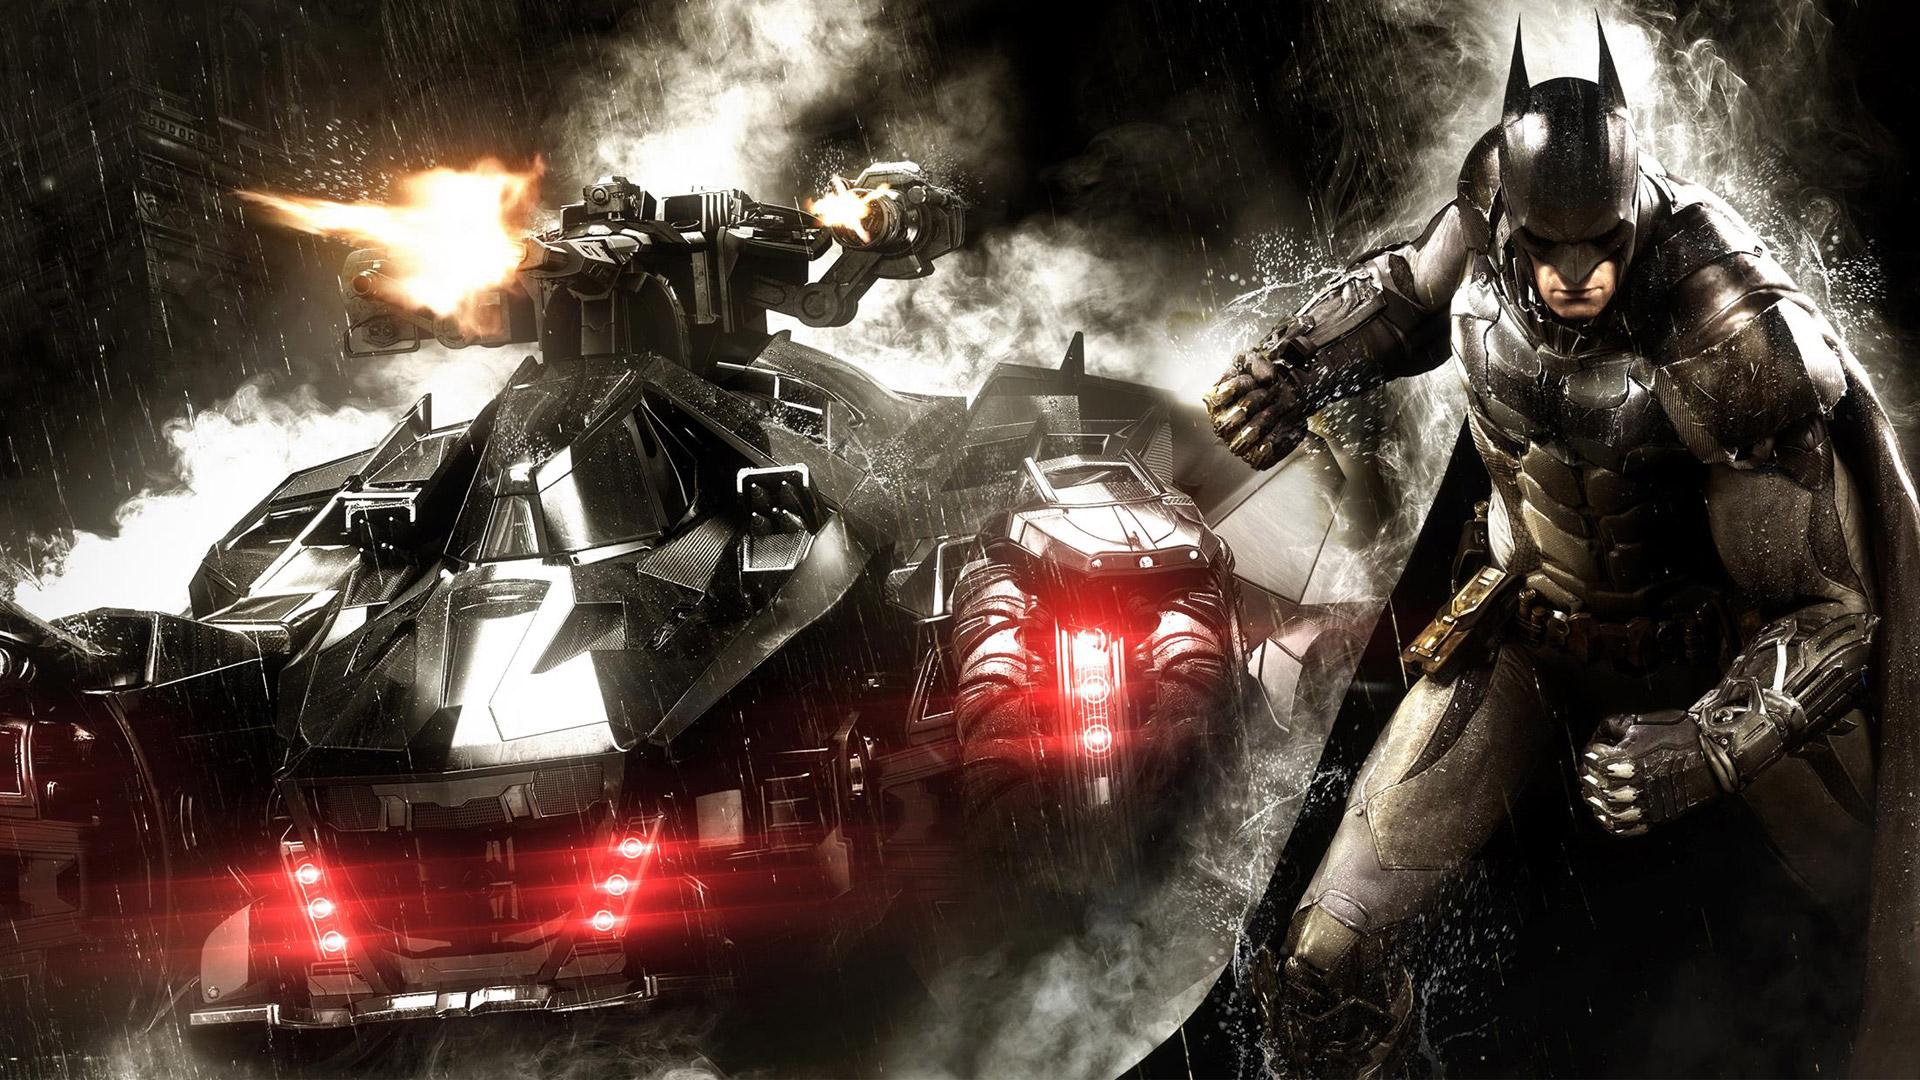 Batman Arkham Knight Wallpaper Hd By Freddylolbear On Deviantart